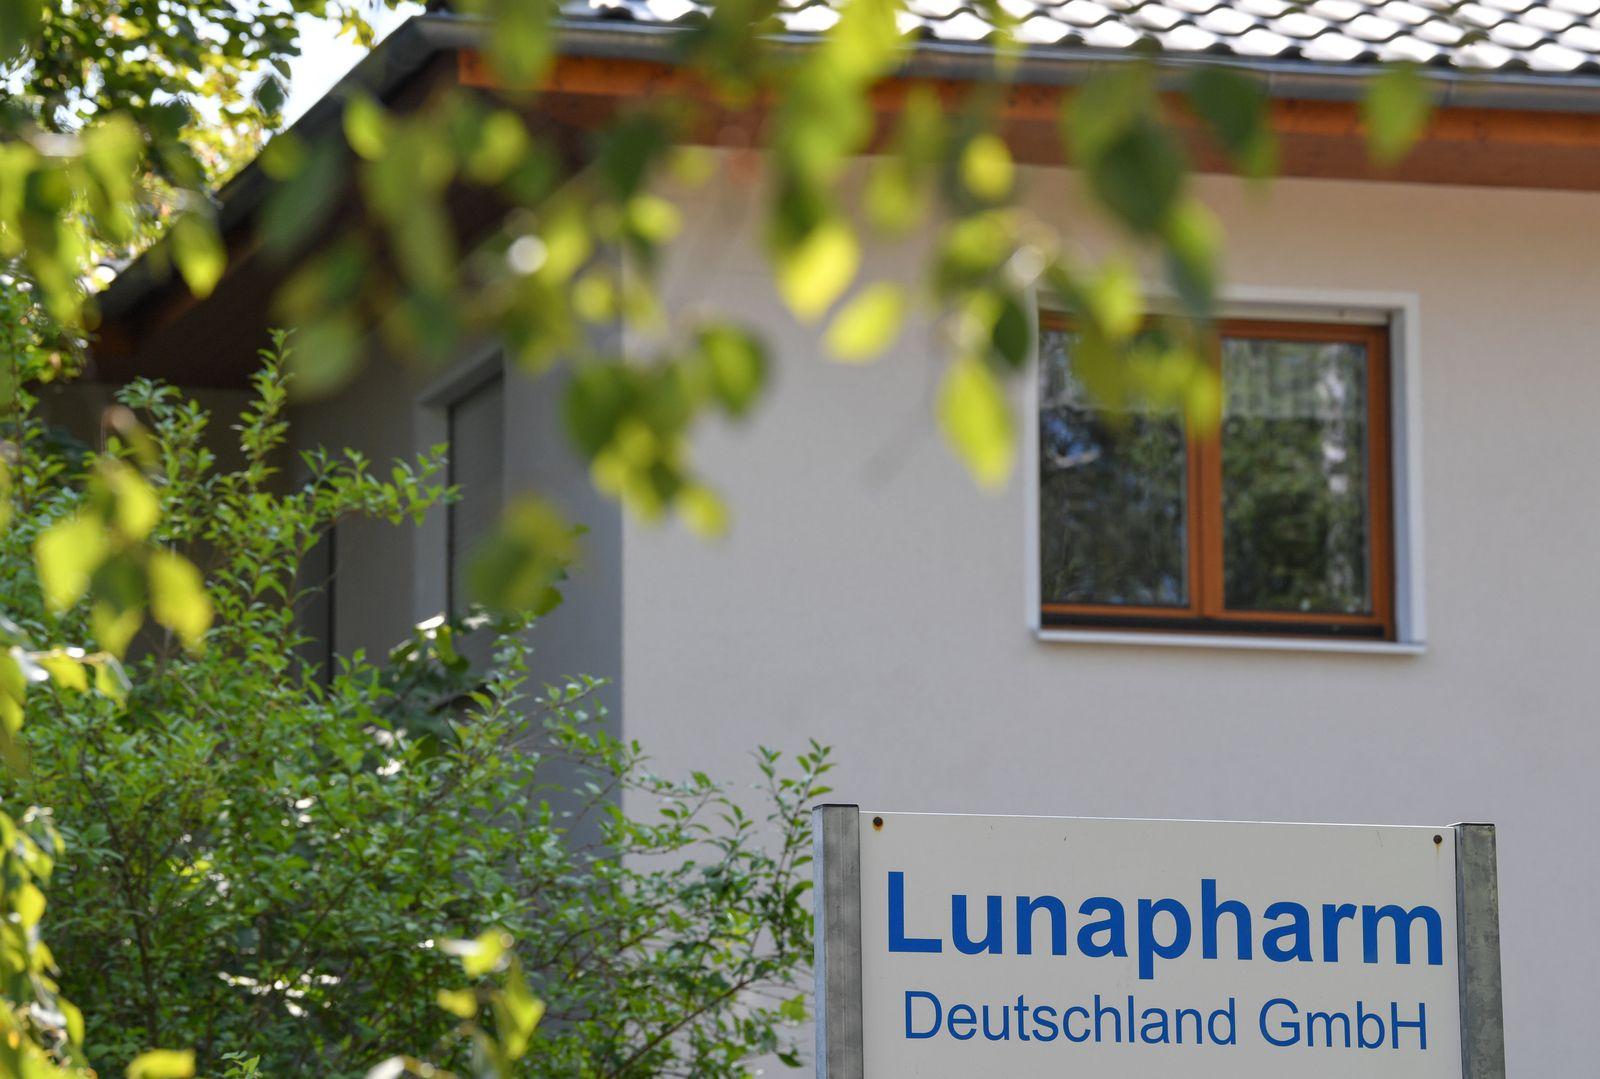 Arzneimittelskandal / Lunapharm